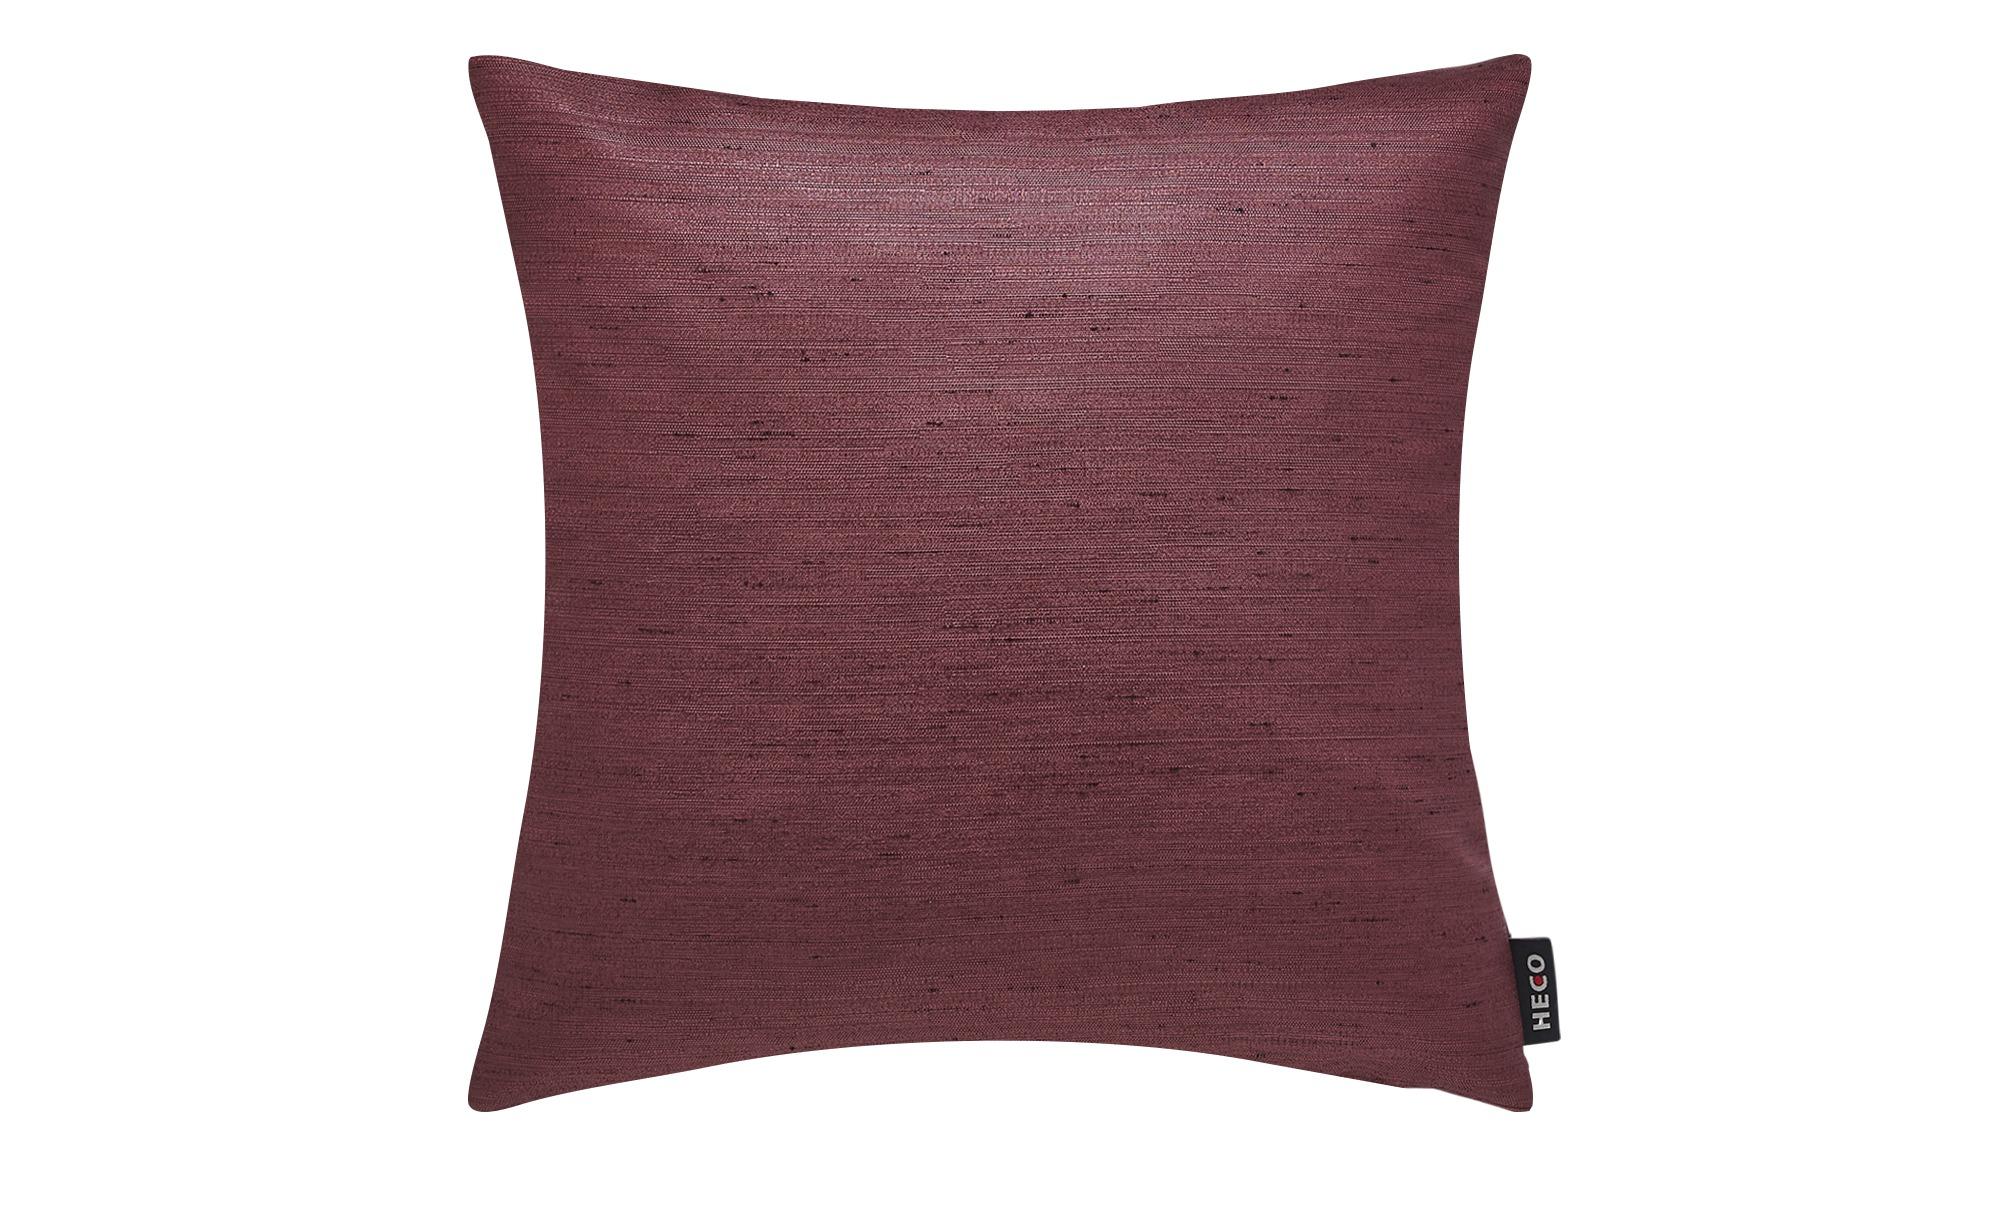 Kissen  Jaipur ¦ lila/violett ¦ 100% Federfüllung ¦ Maße (cm): B: 40 Heimtextilien > Kissen > Dekokissen - Höffner